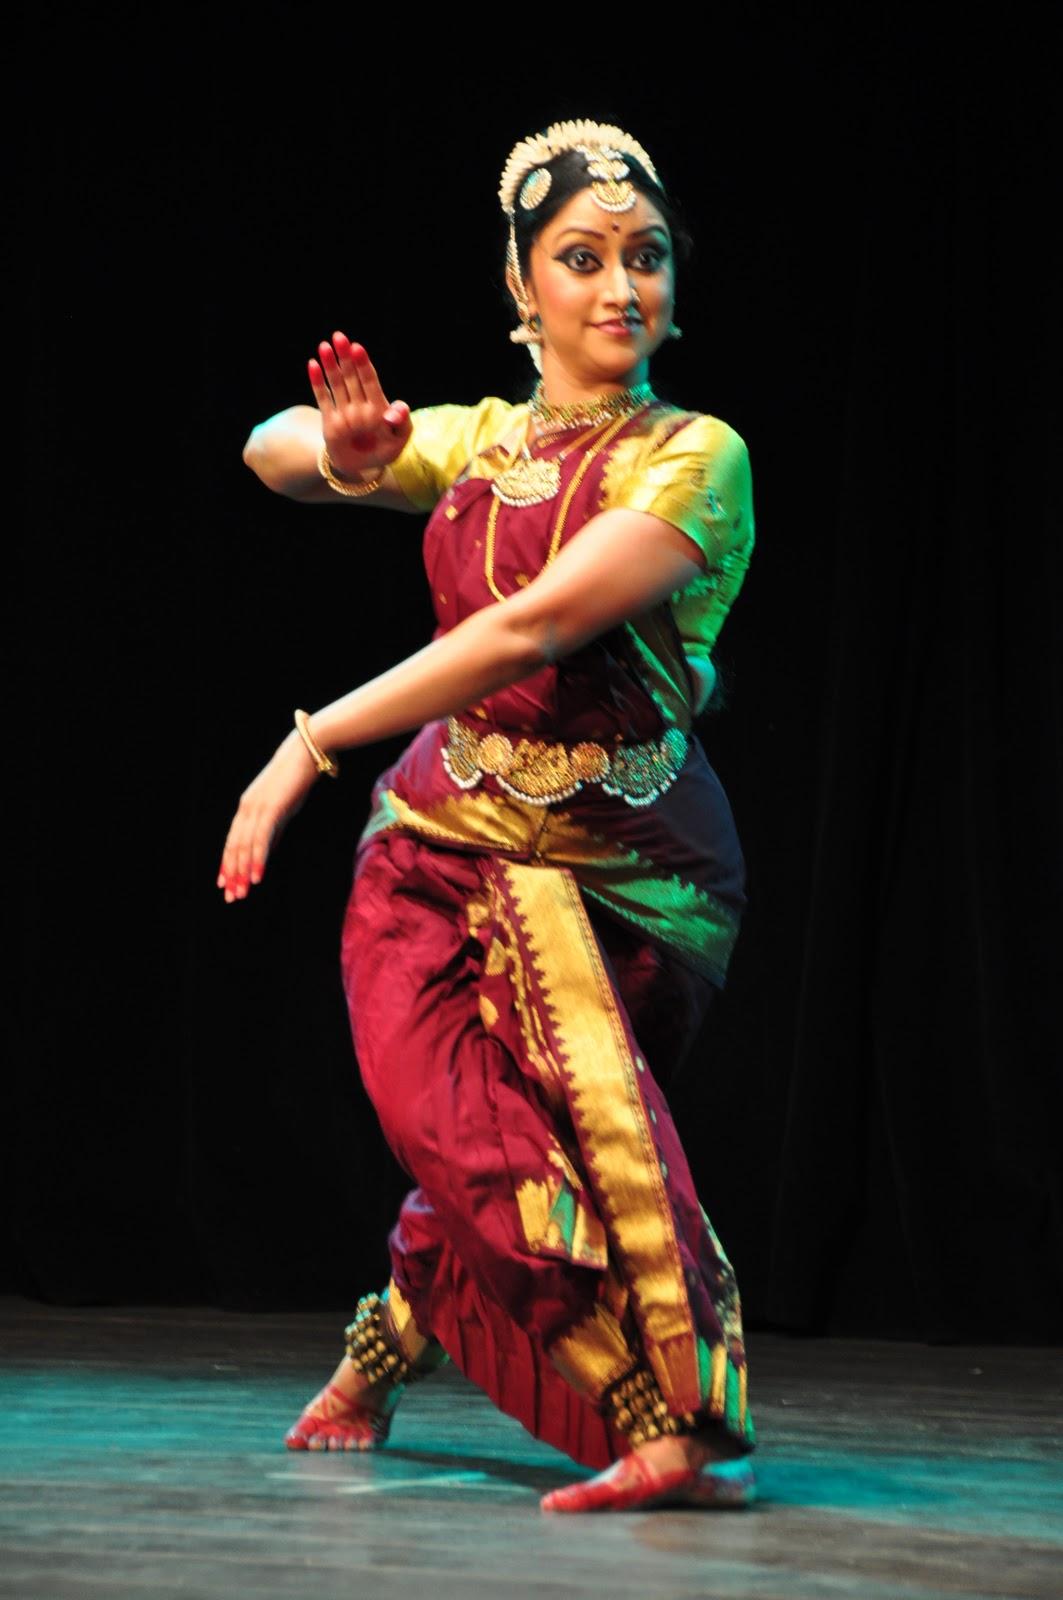 bharatanatyam poses - photo #4